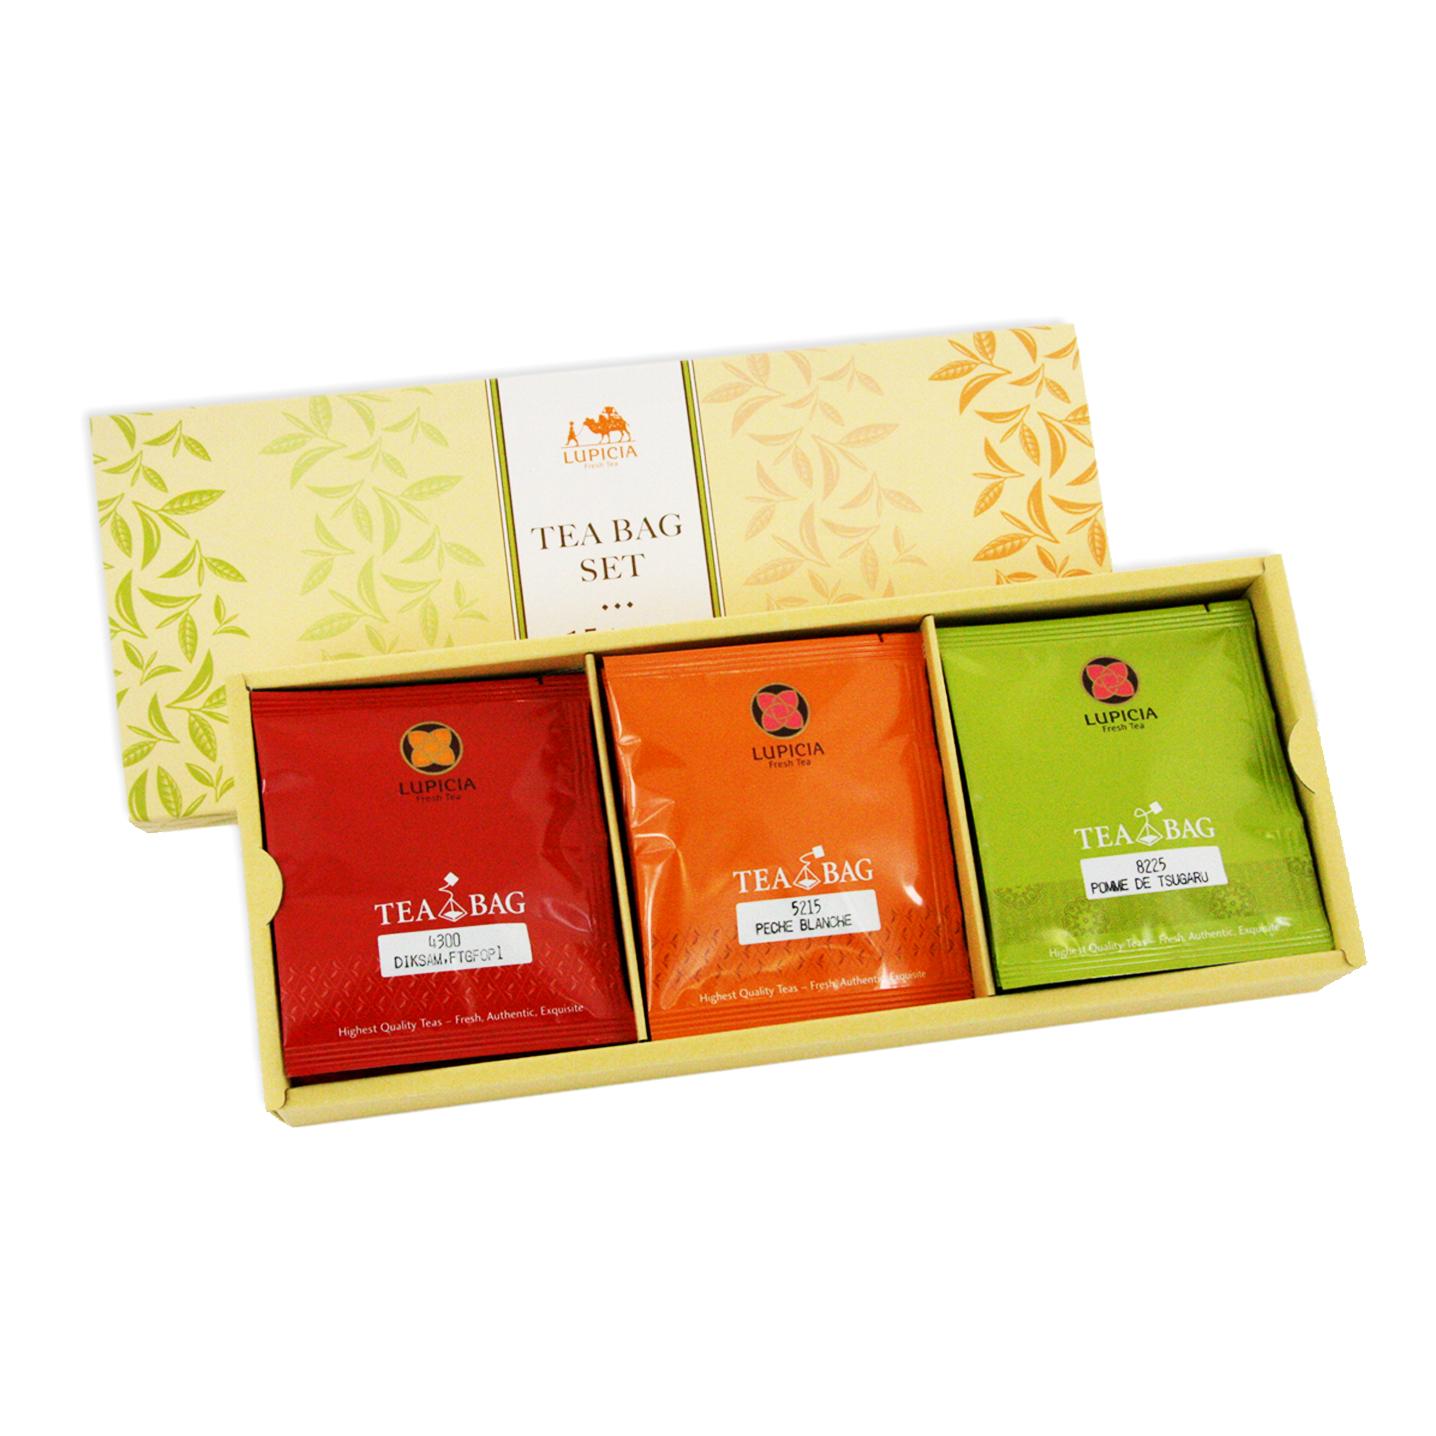 Tea bag set pieces lupicia